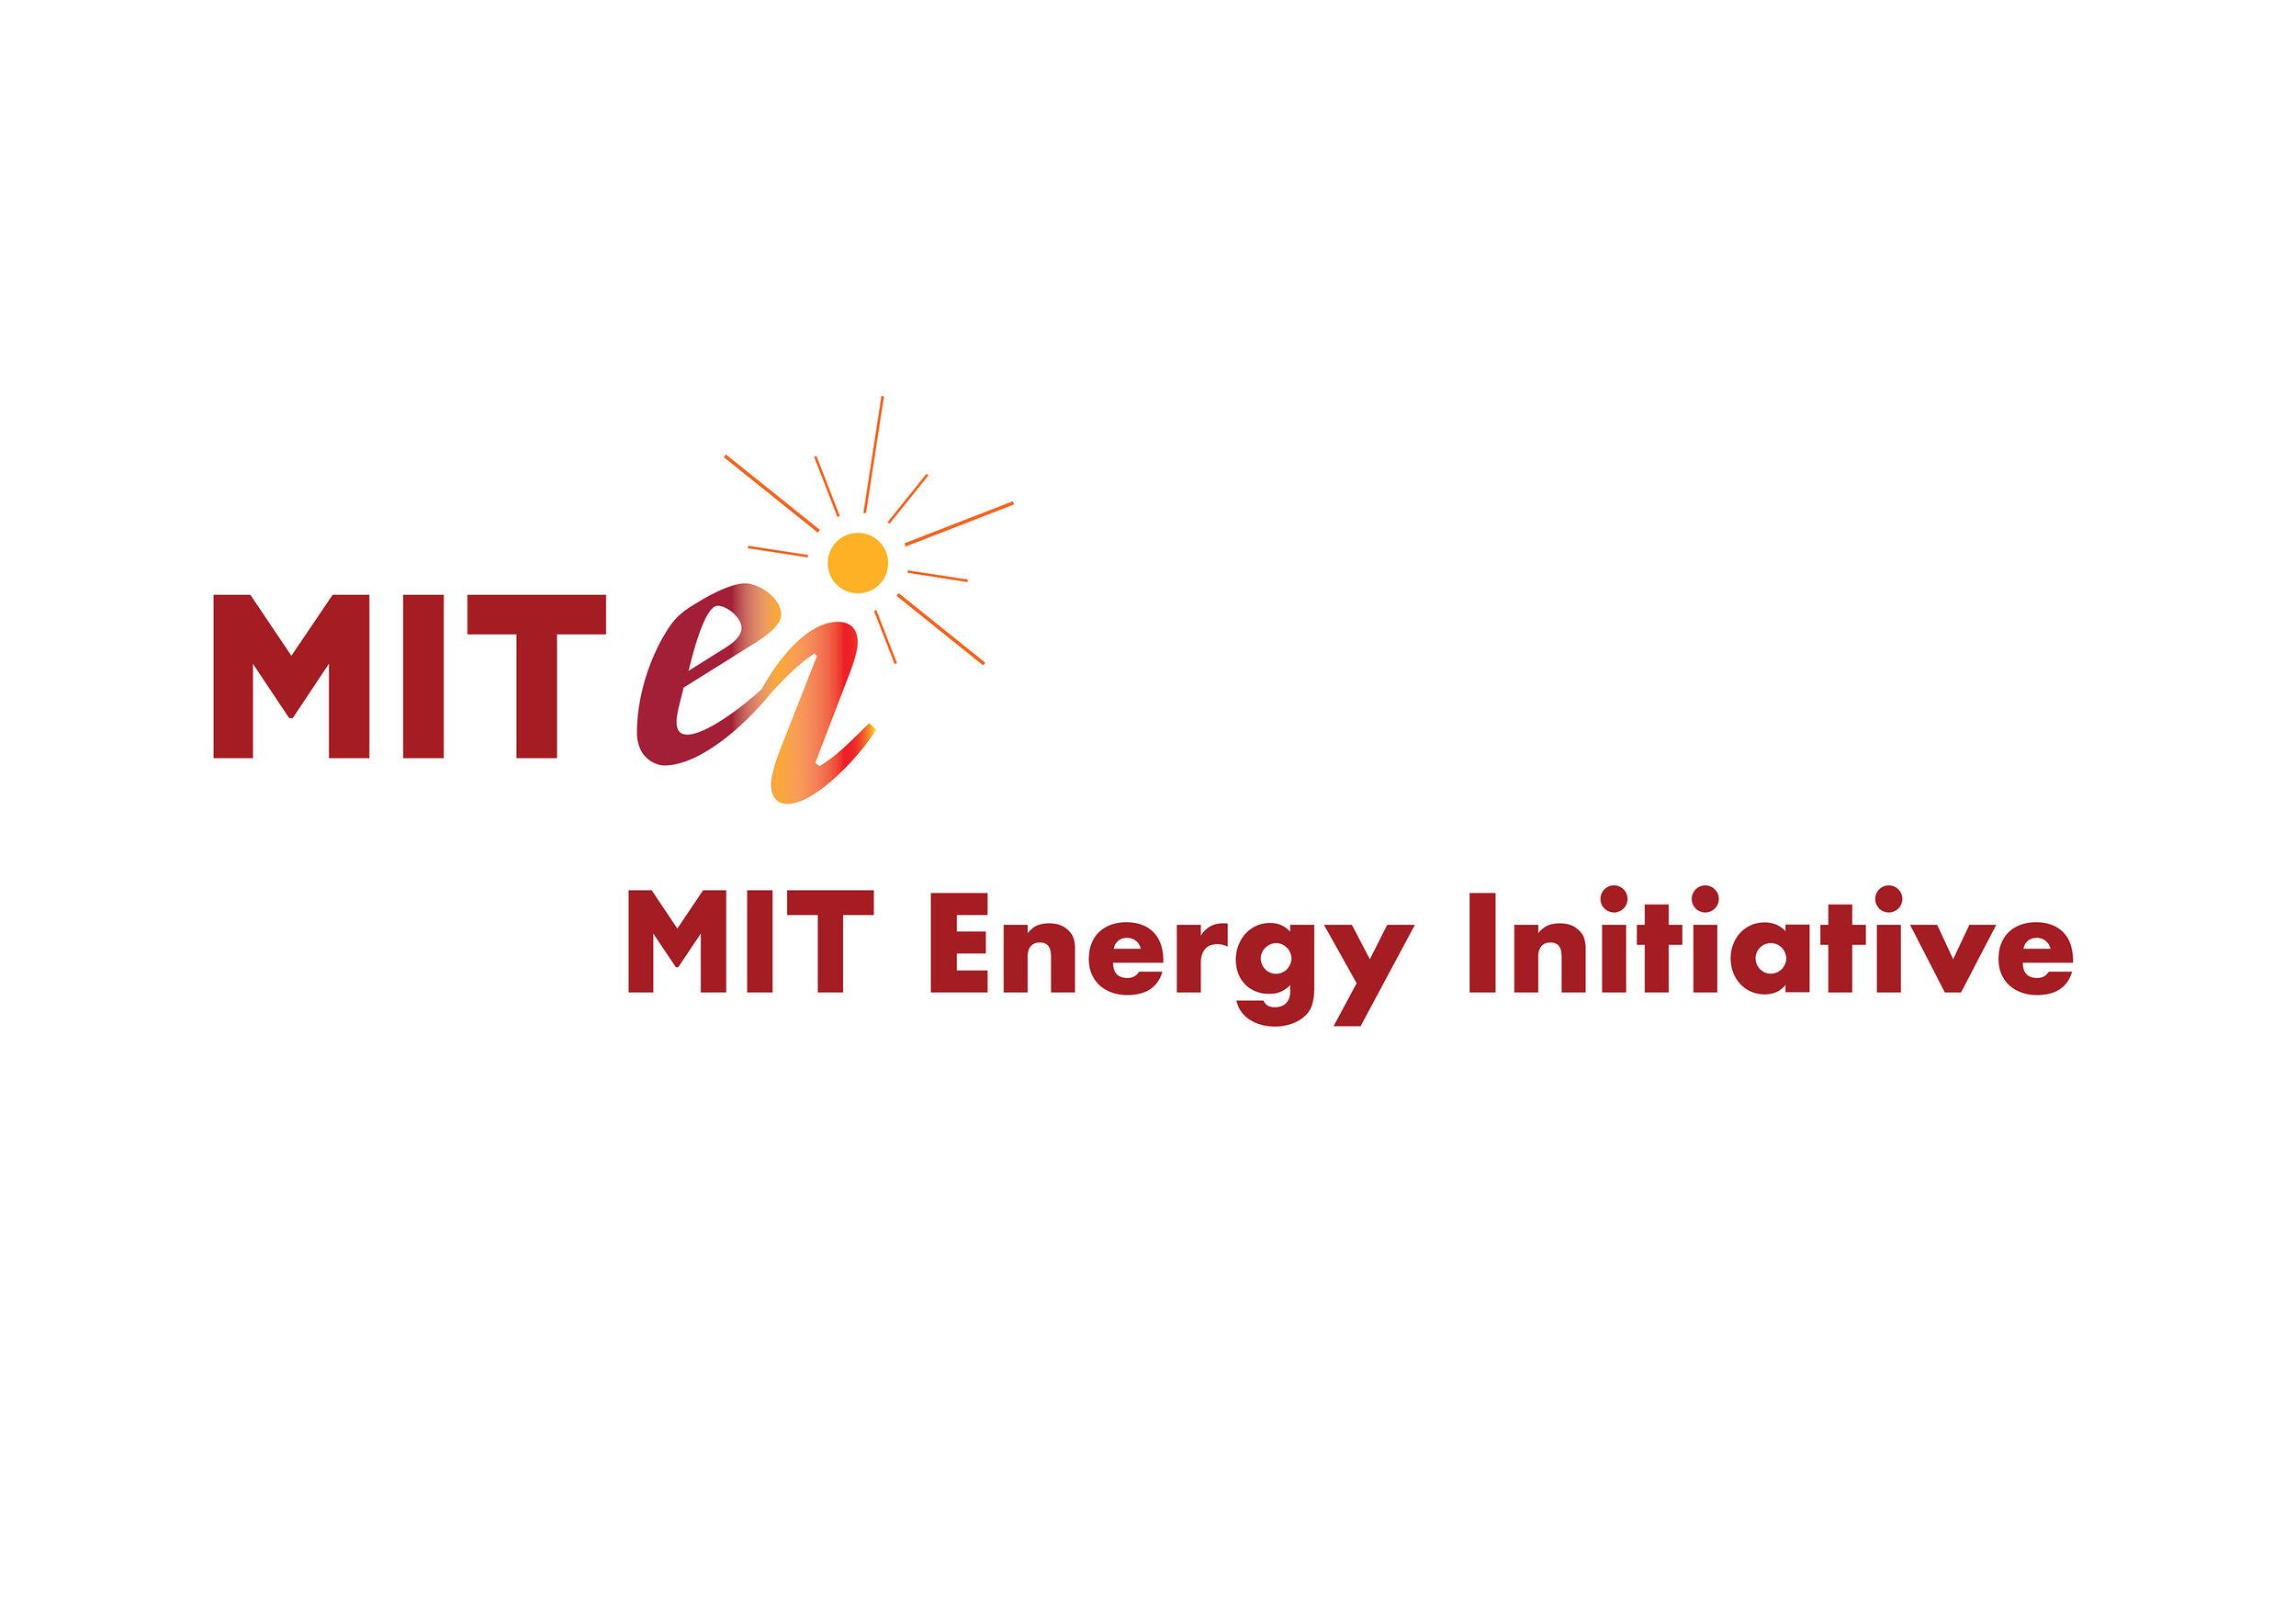 MITEI_logo-2fulcrp1lrgmed.jpg